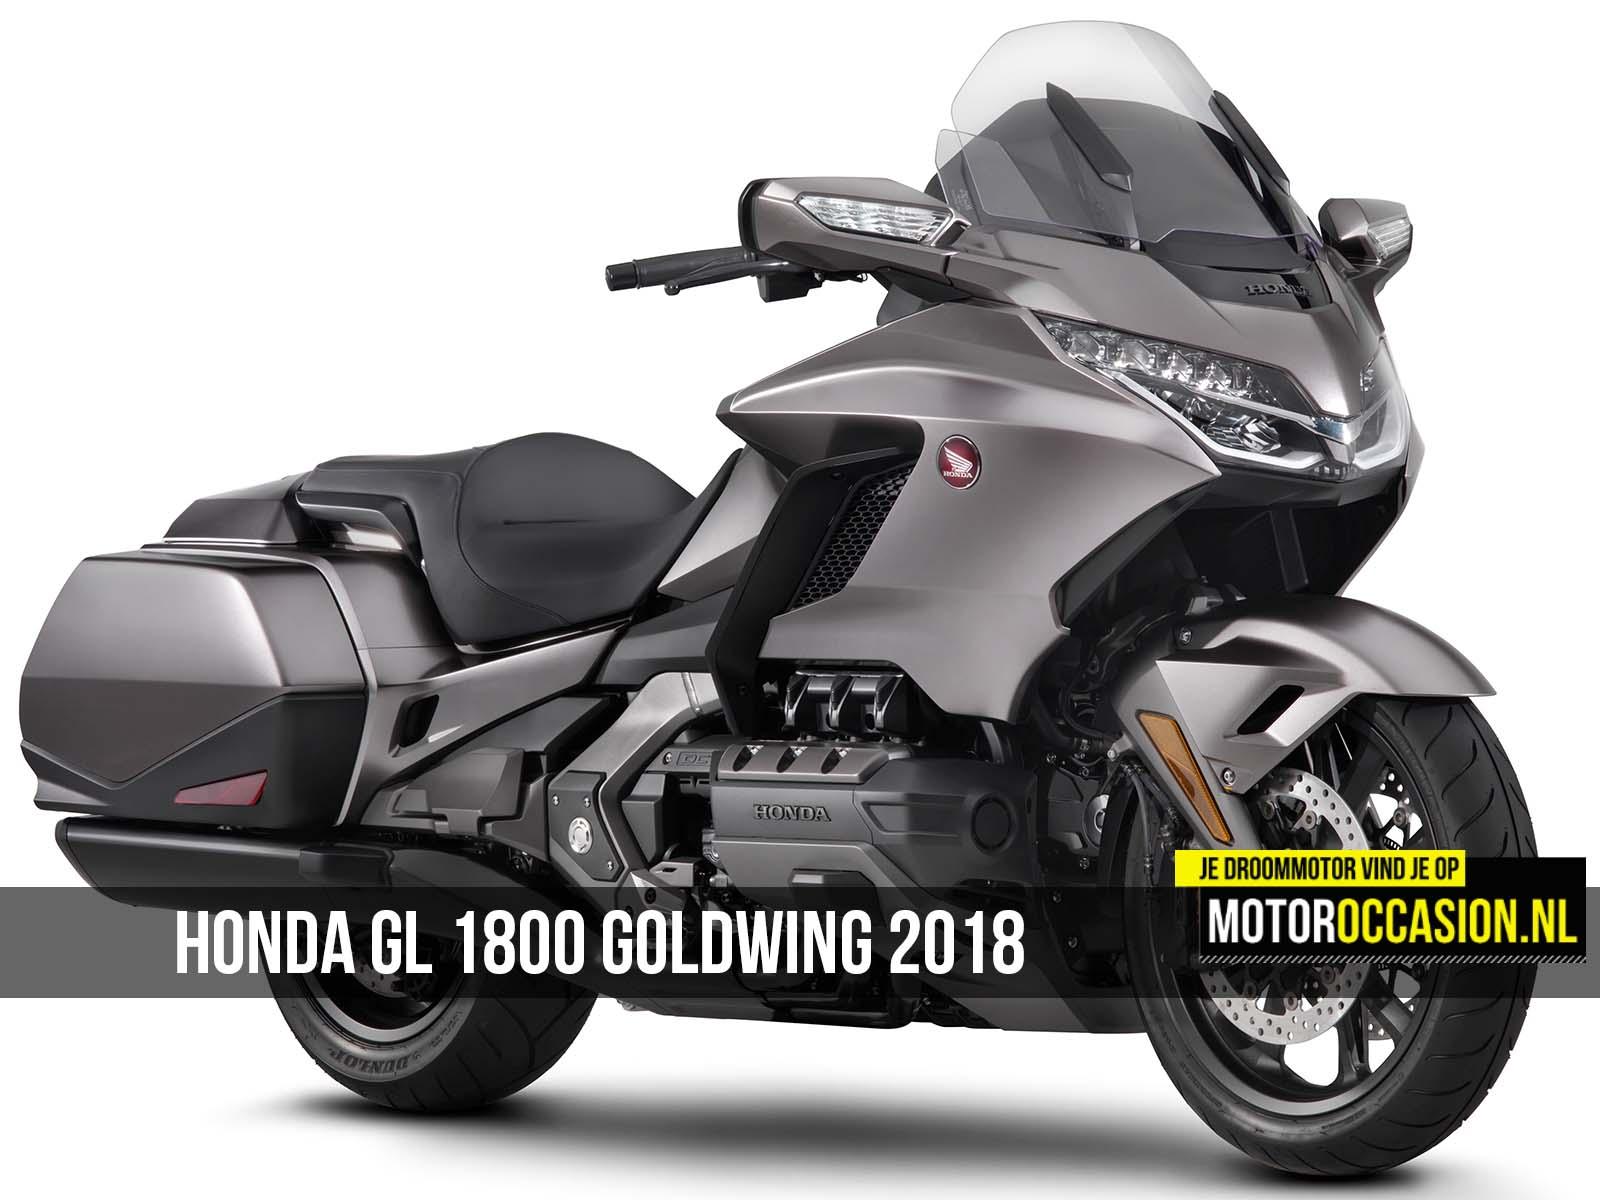 Motoroccasion.nl, Honda GL 1800 Goldwing 2018 is ...